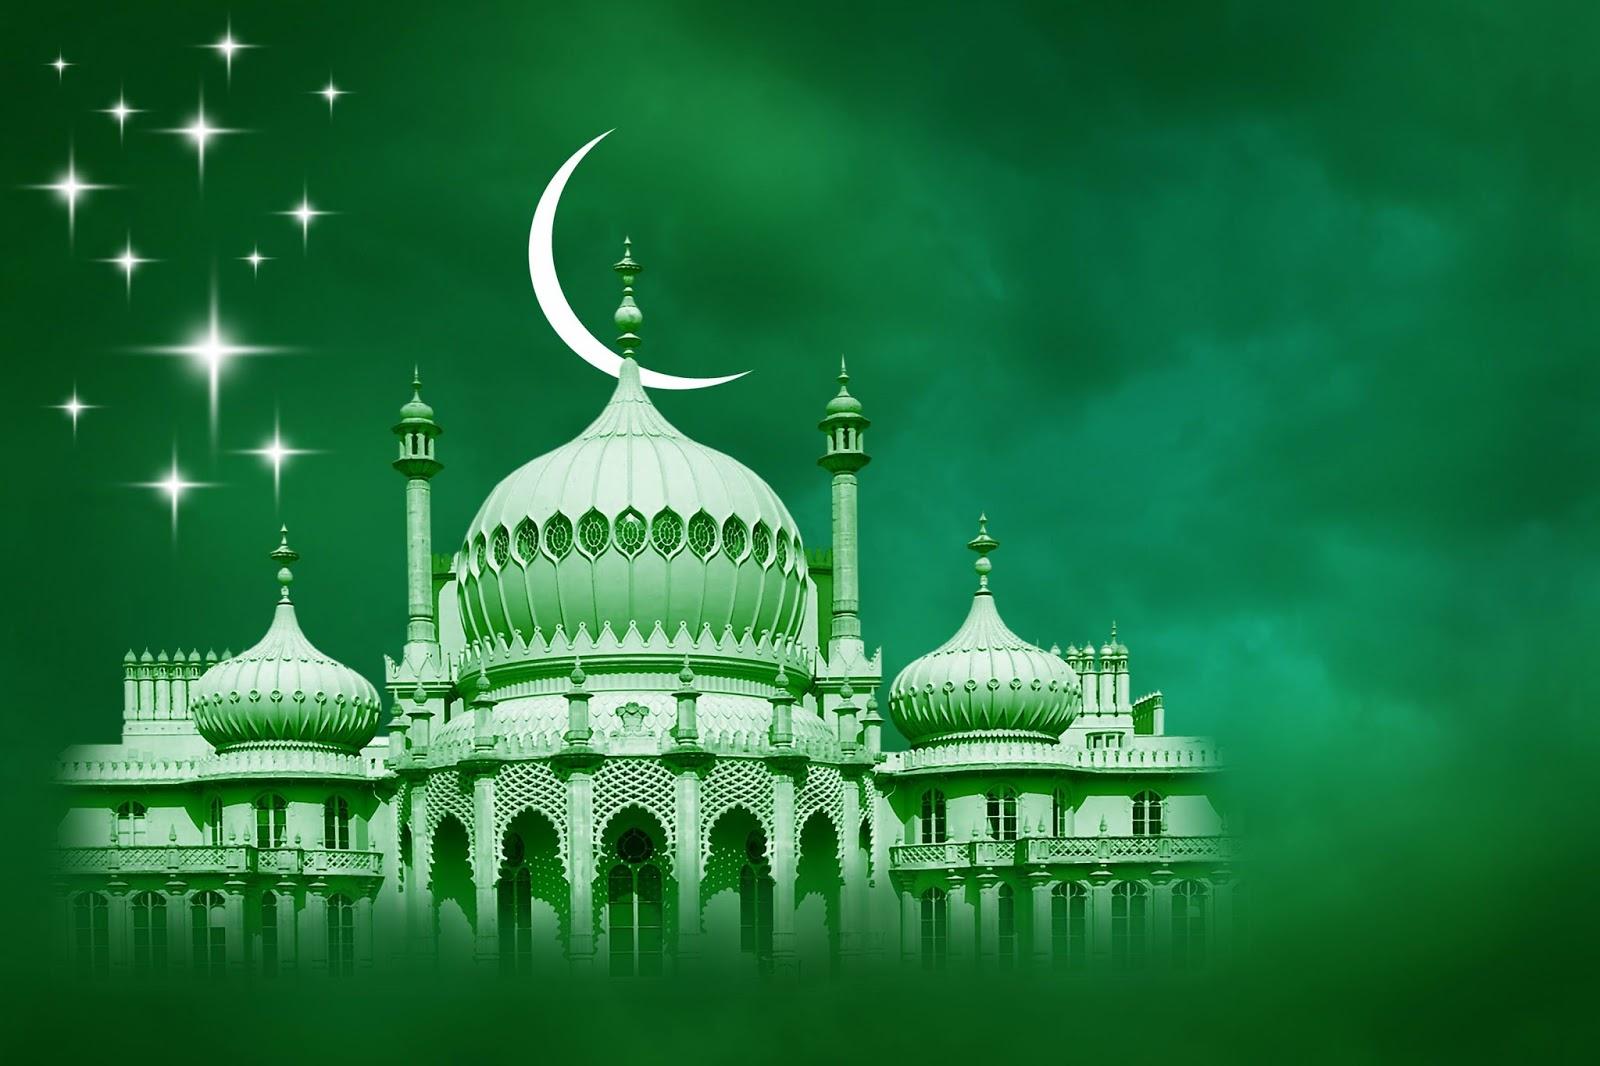 Download 580 Background Islami Kosong HD Terbaik